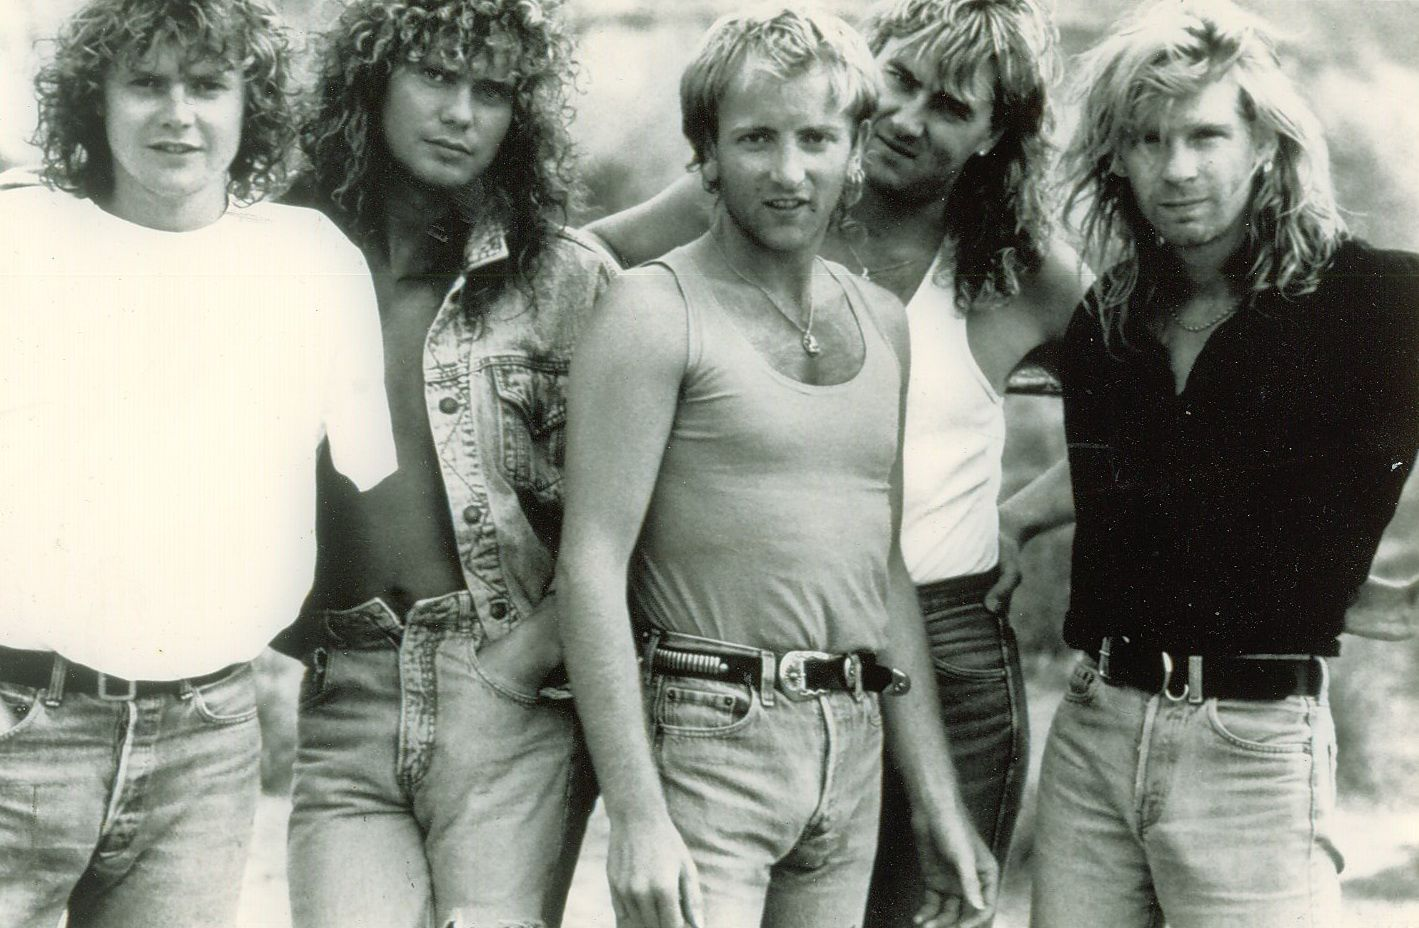 Rick Allen, Steve Clark, Joe Elliott, Phil Collen and Rick Savage (Def Leppard)